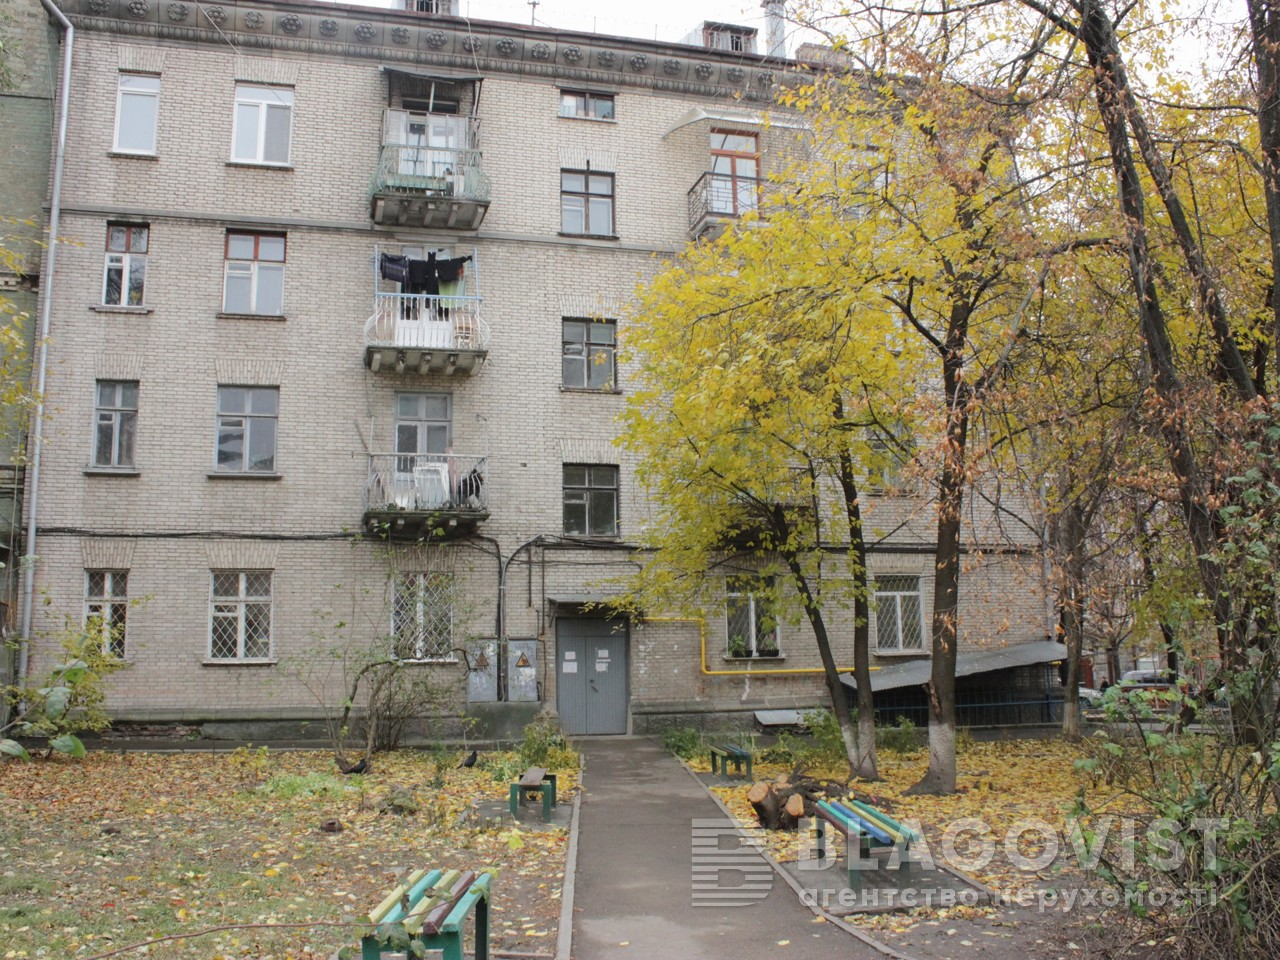 Квартира R-23545, Рейтарская, 30, Киев - Фото 4